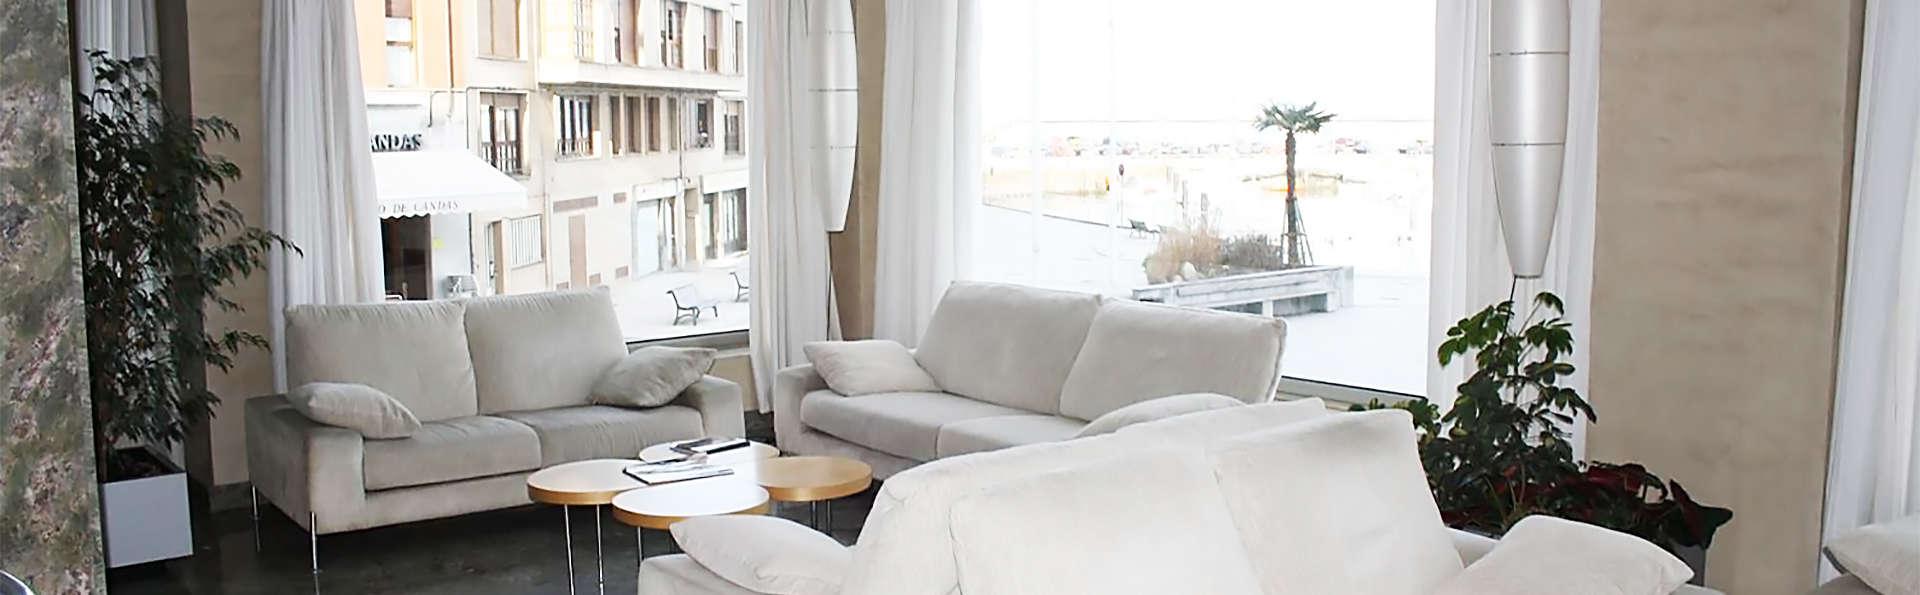 Hotel City House Marsol - EDIT_hall1.jpg